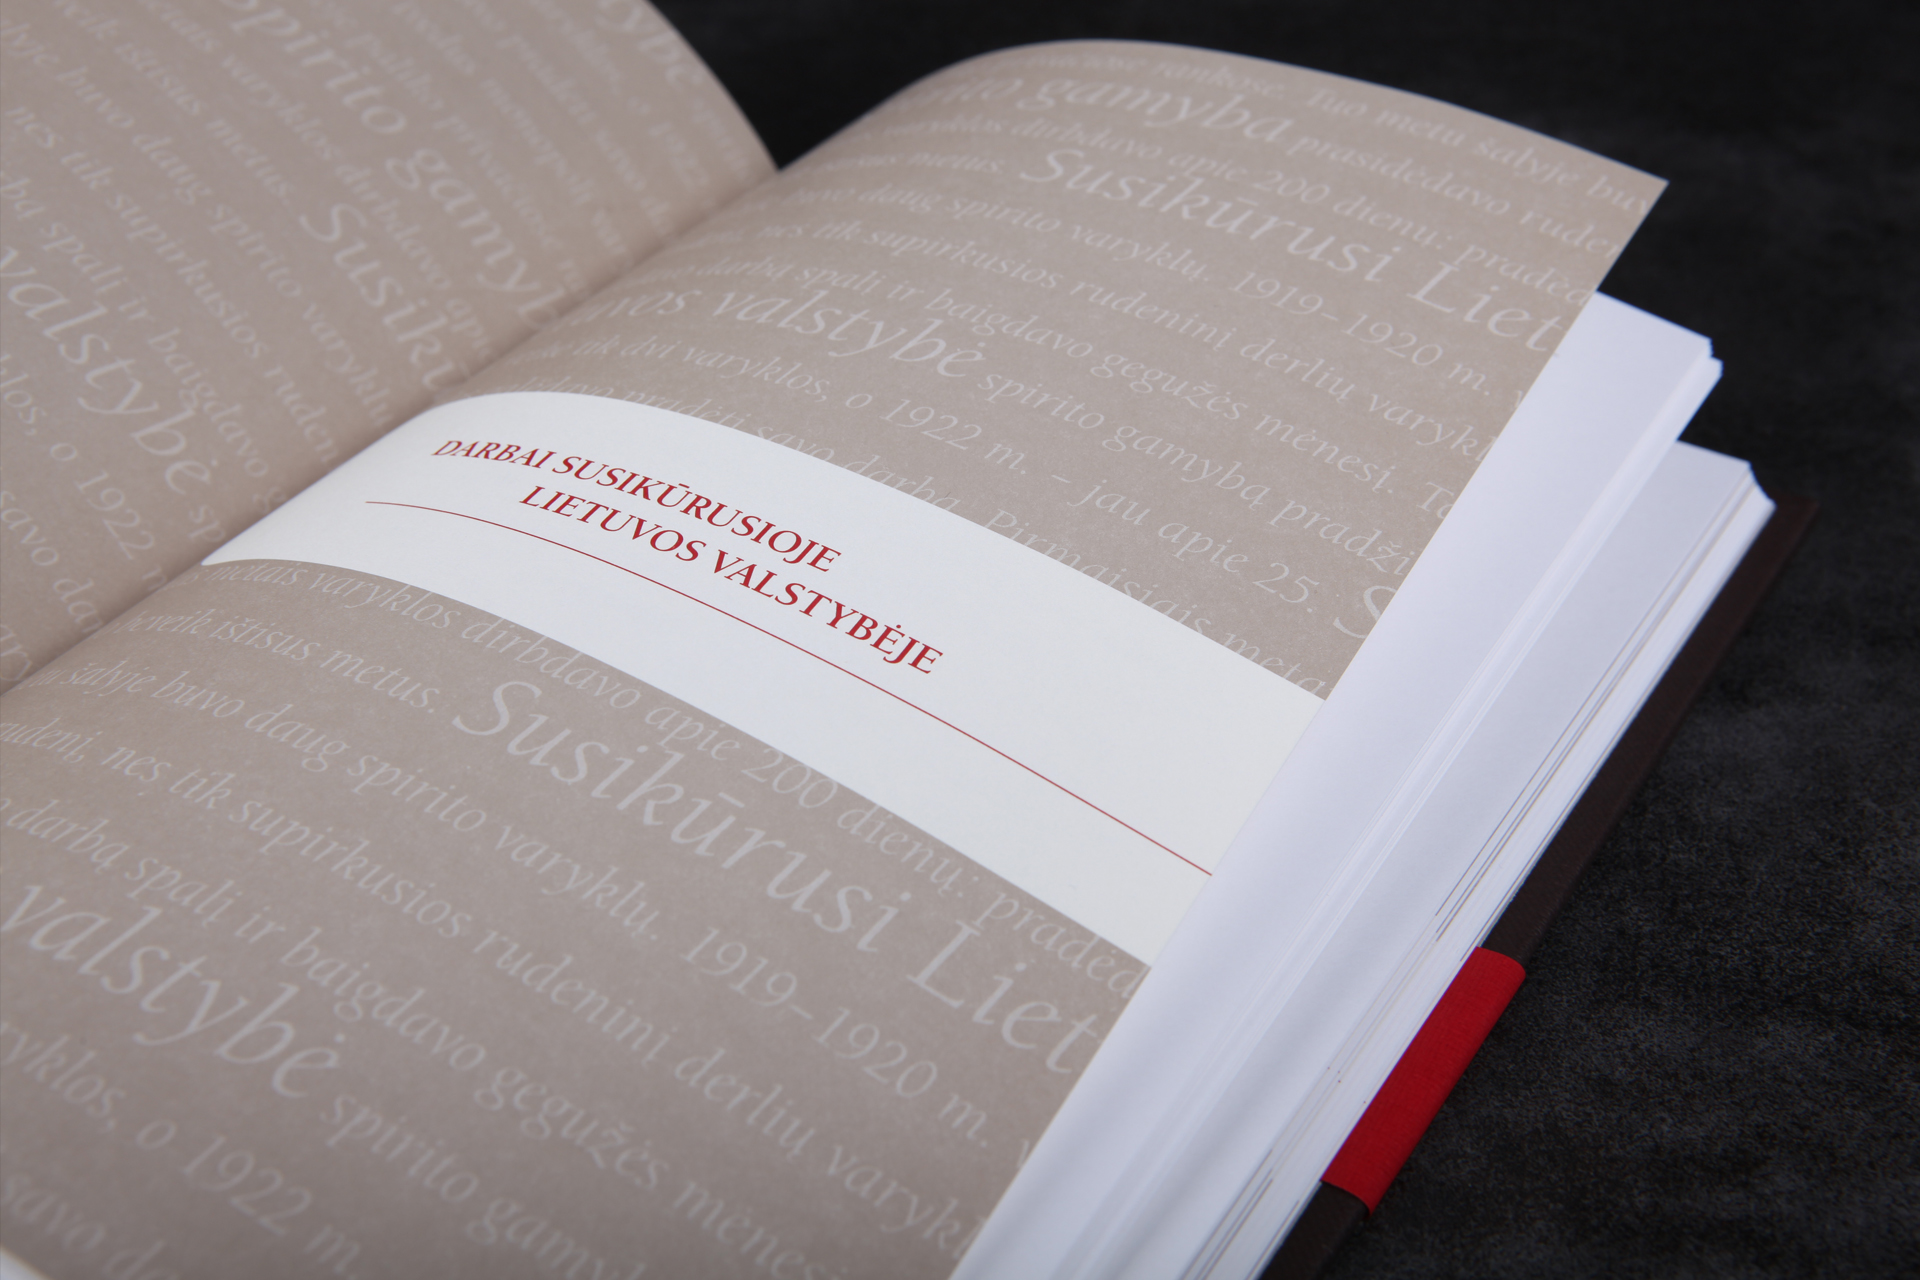 Stumbras Book